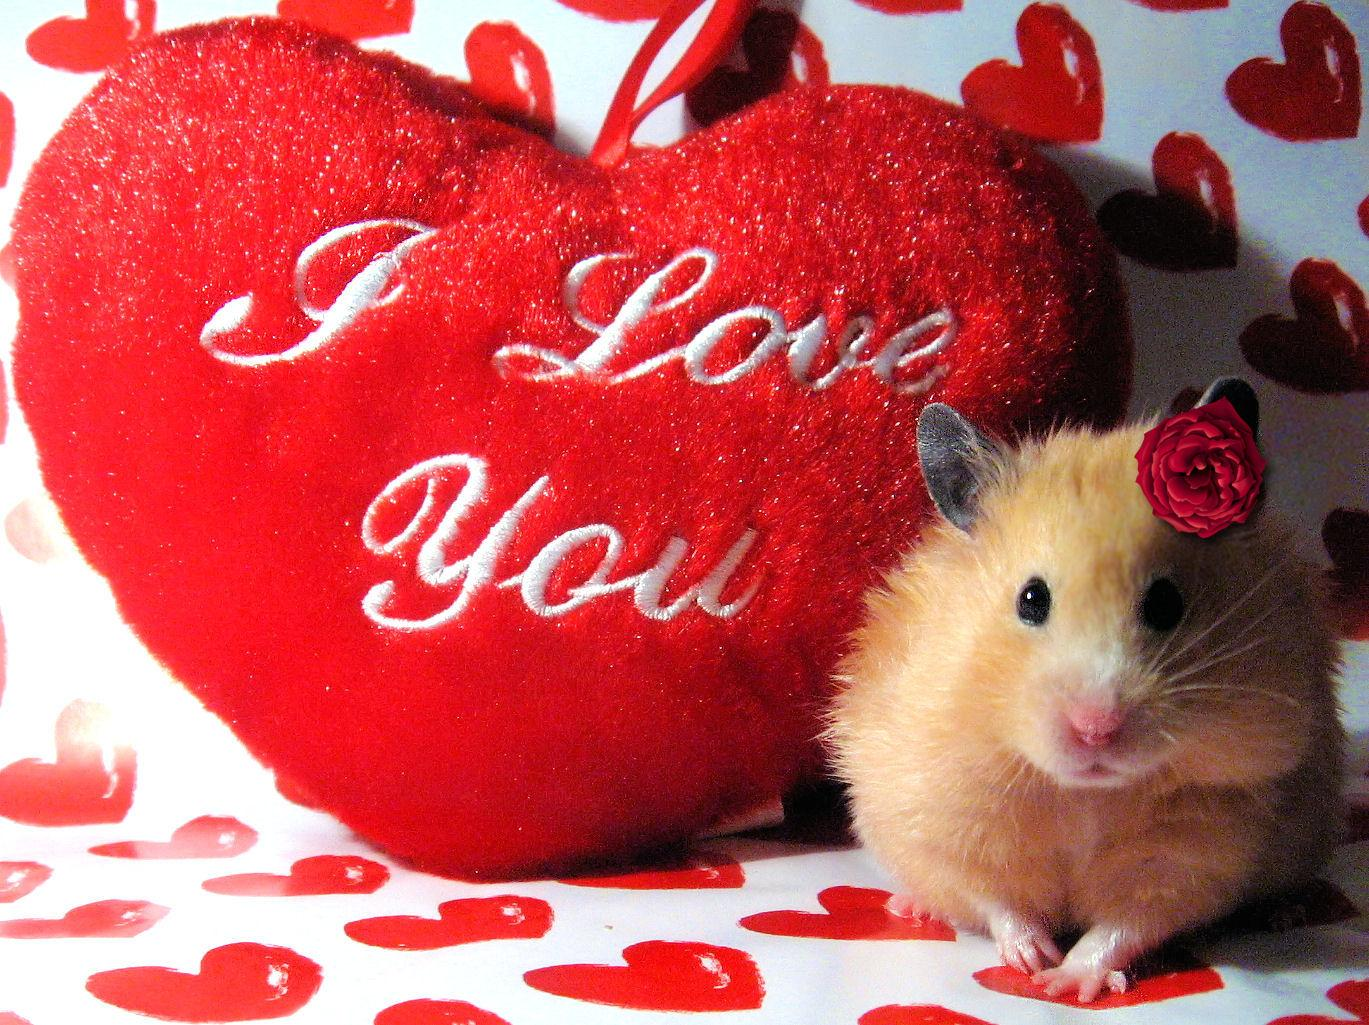 Cute Hamster Love Wallpaper 3816 Wallpaper Wallpaper Screen 1369x1025